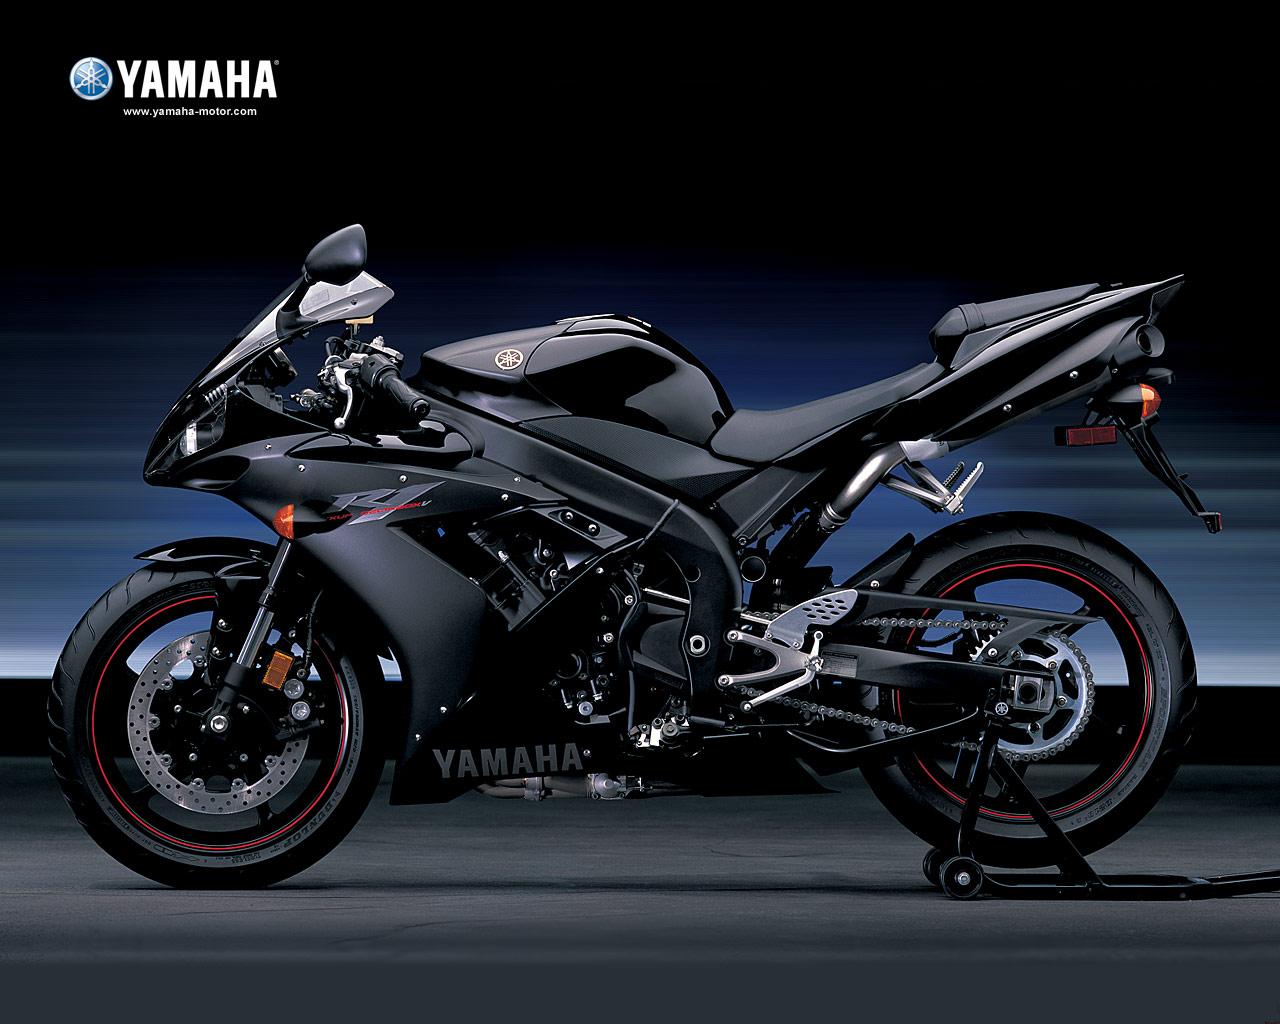 2009 Yamaha R1 Wallpaper 7014 Hd Wallpapers in Bikes   Imagescicom 1280x1024